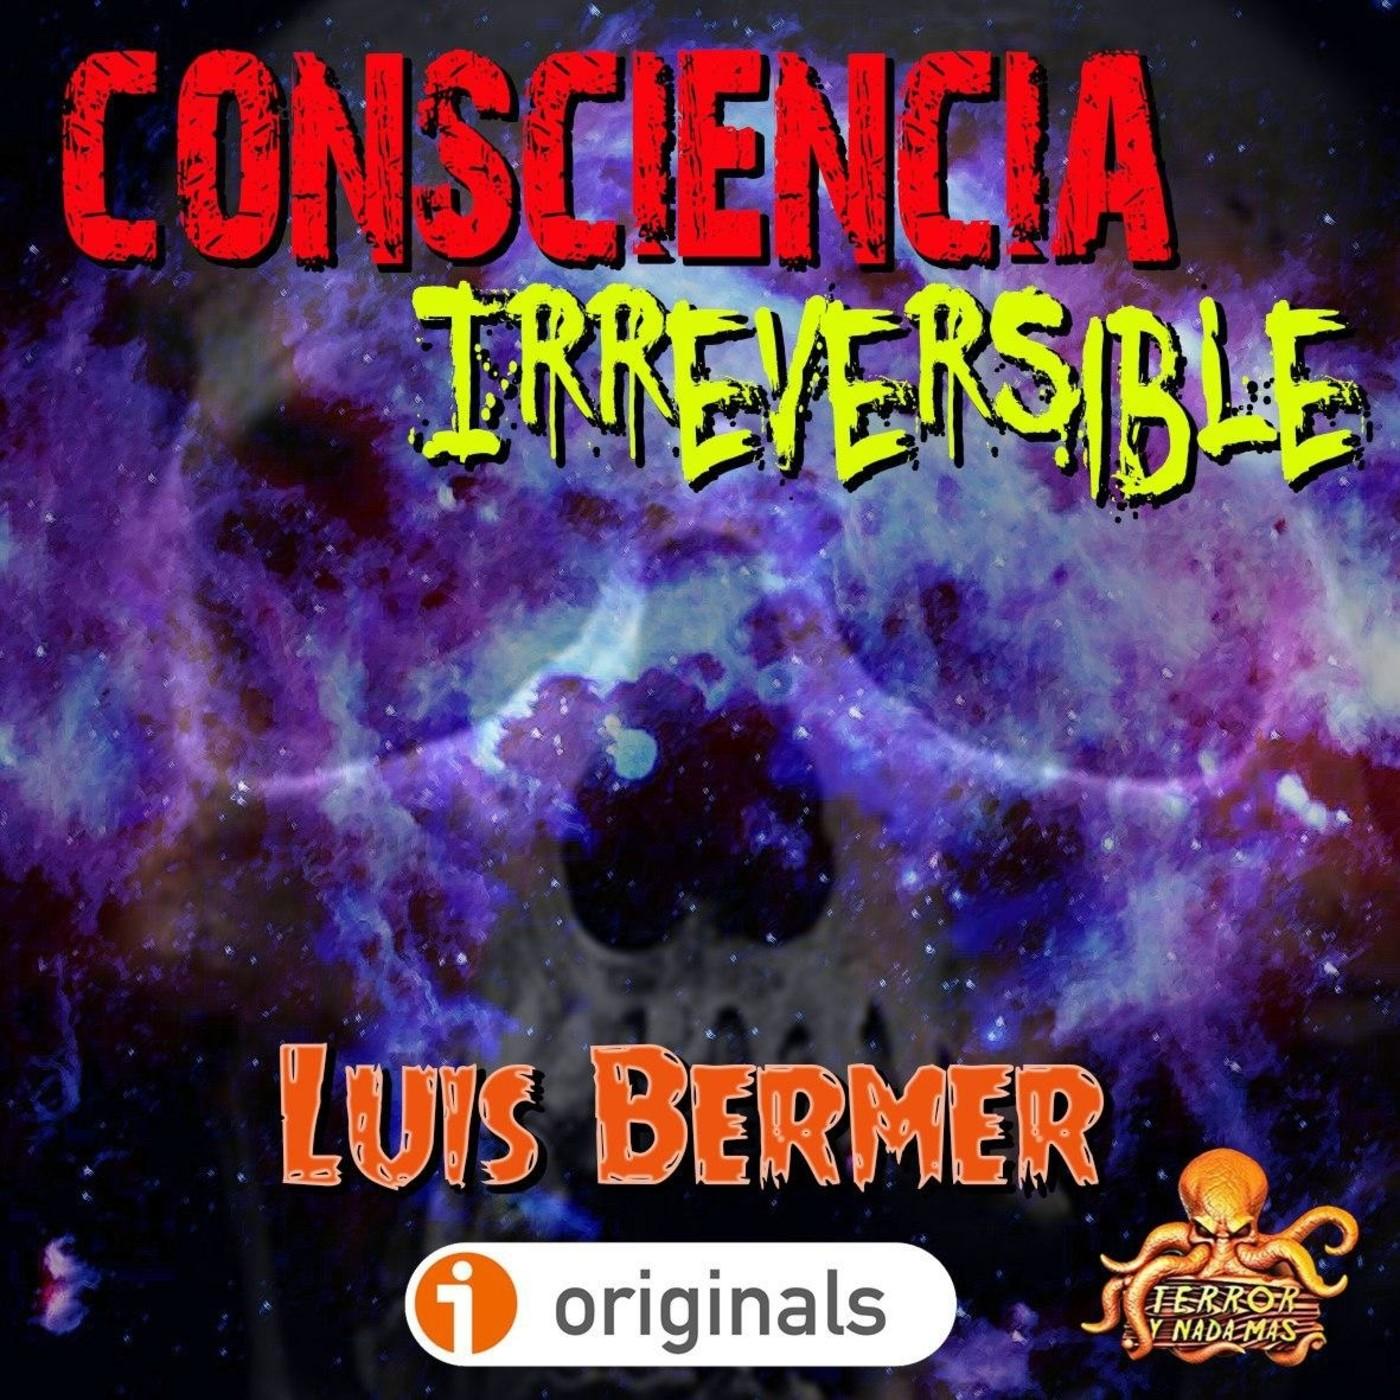 Consciencia irreversible (Luis Bermer) | Audiorrelato - Audiolibro